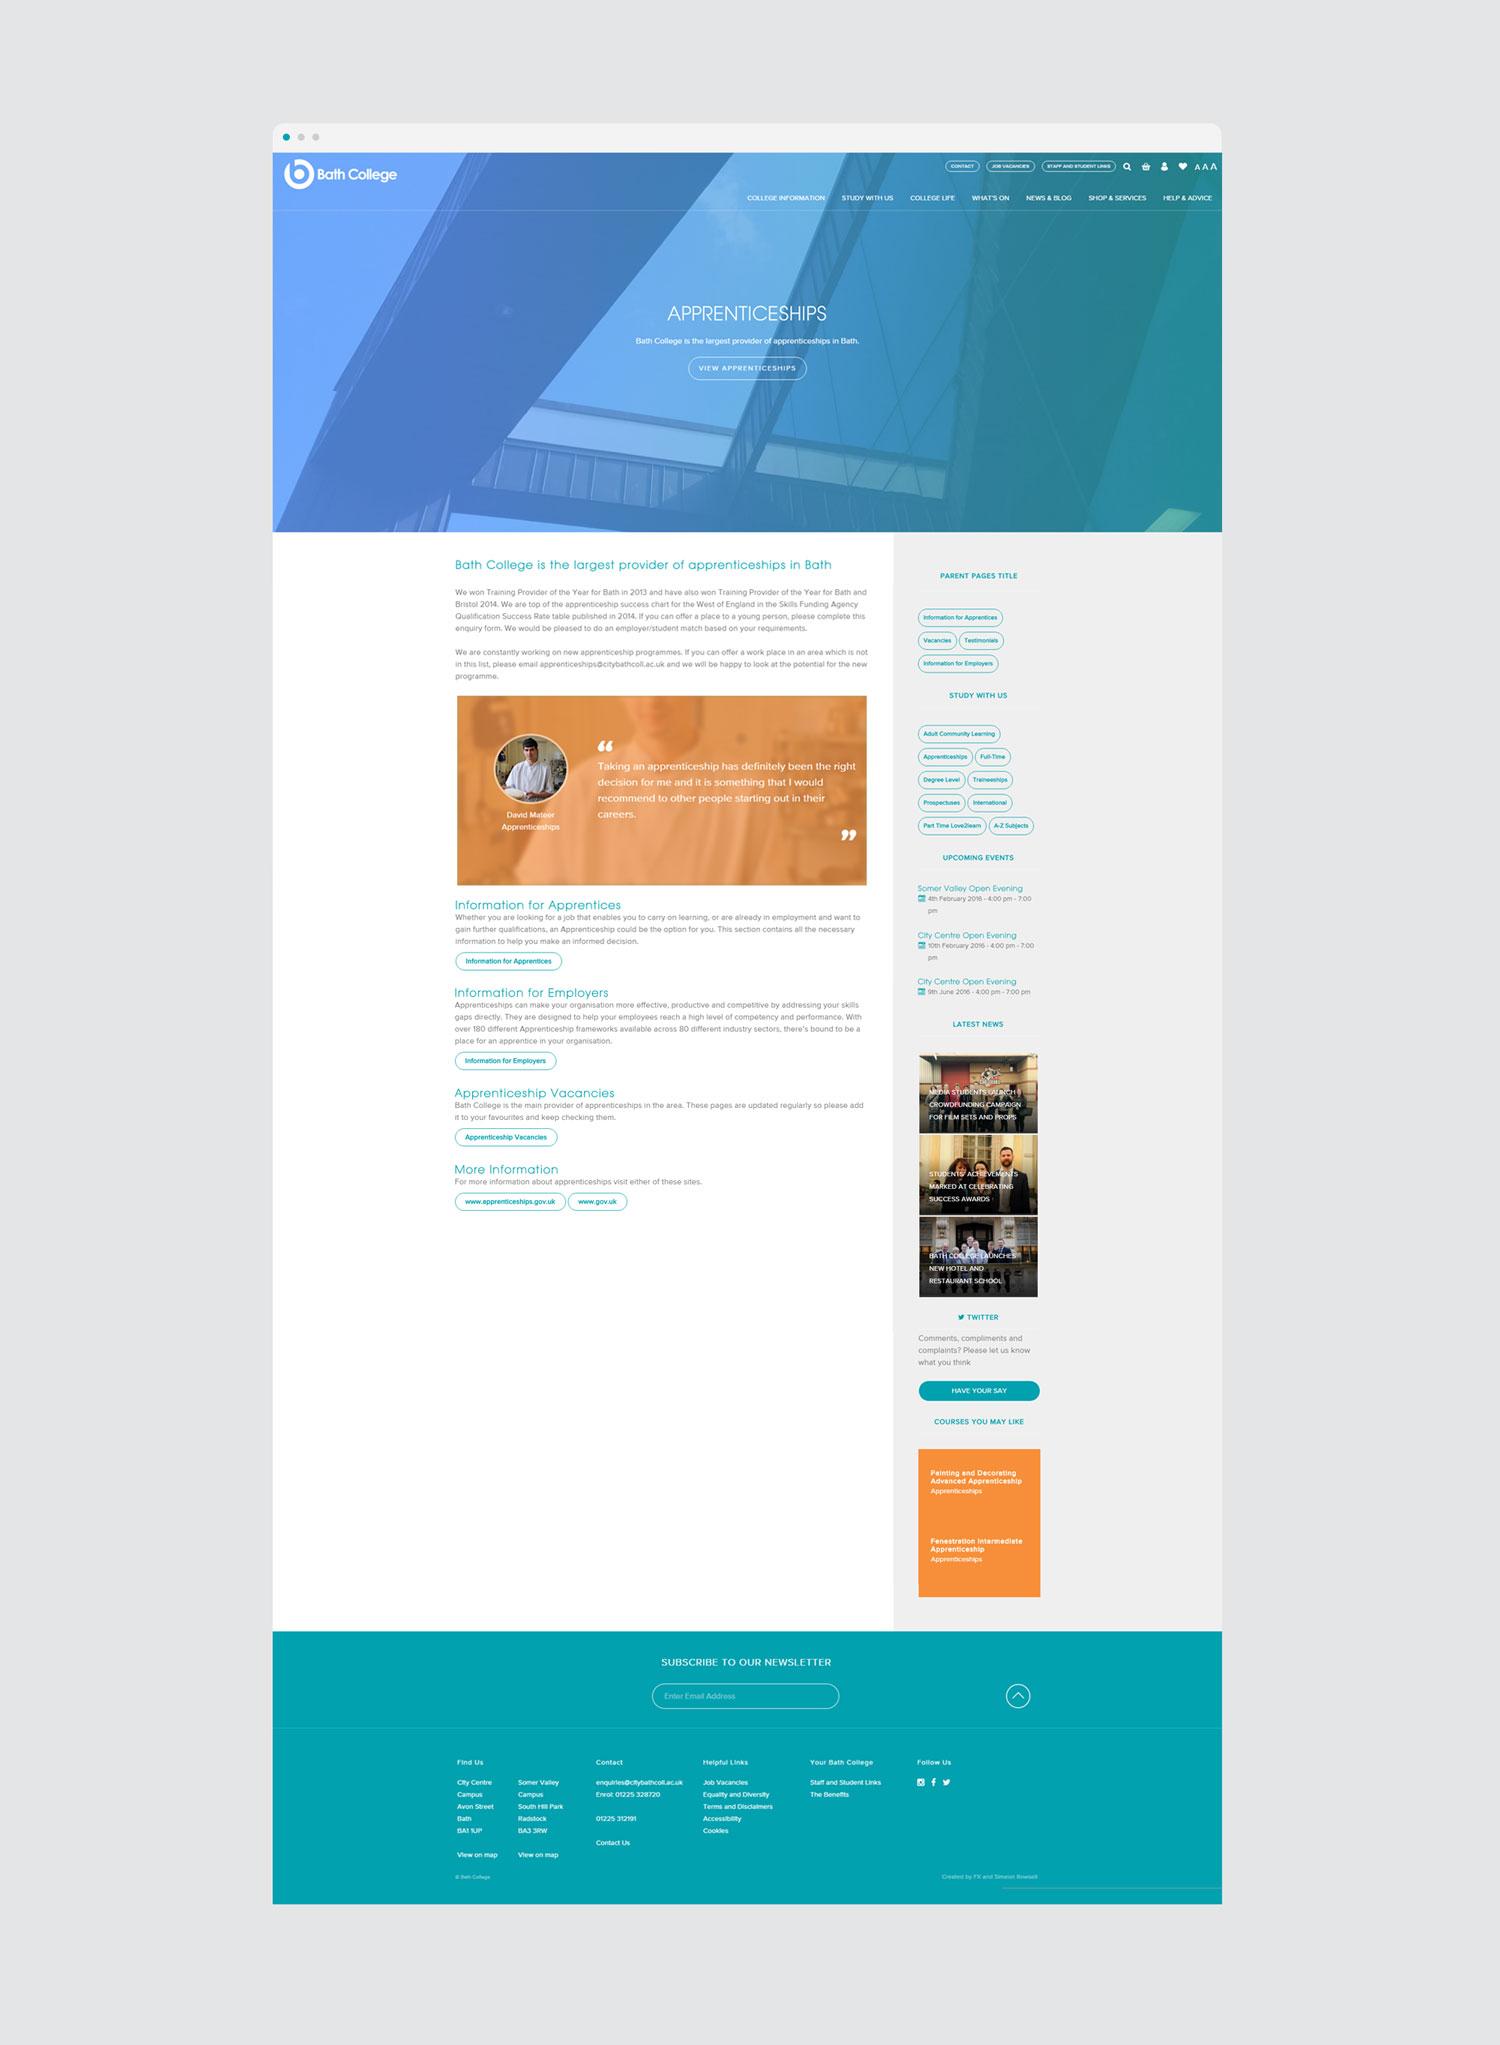 bath college apprenticeship web design